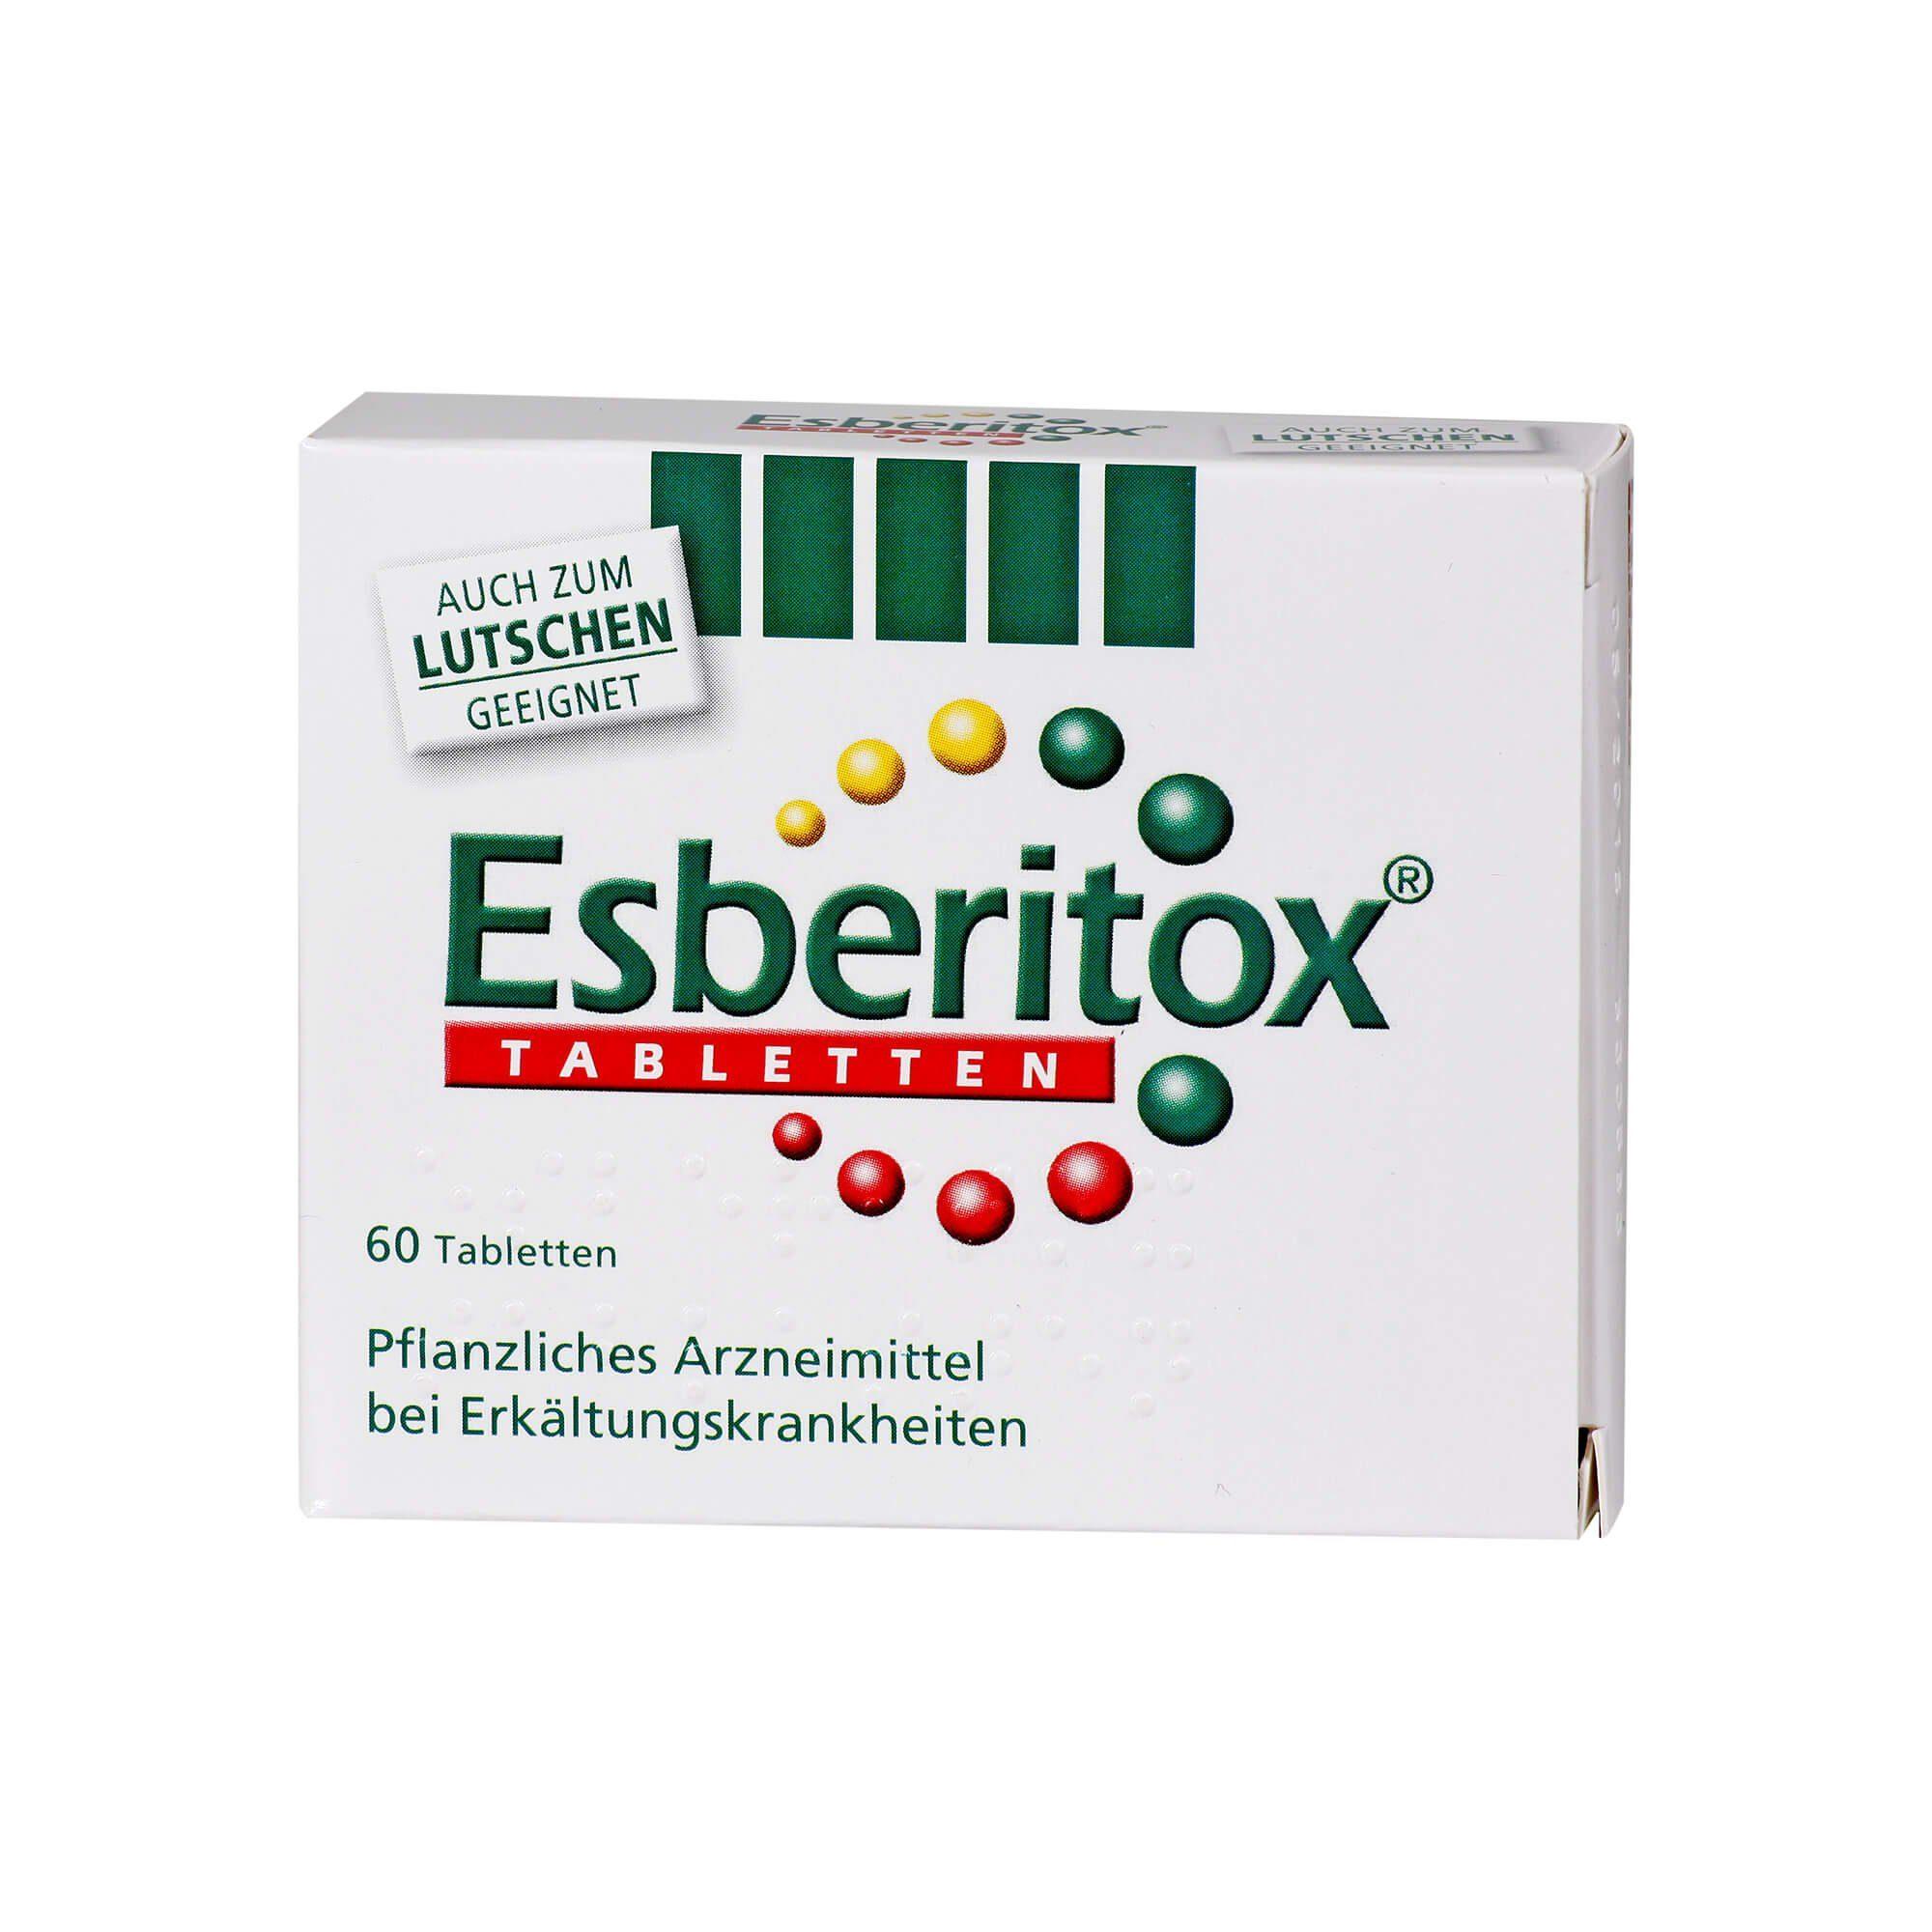 Esberitox Tabletten, 60 St